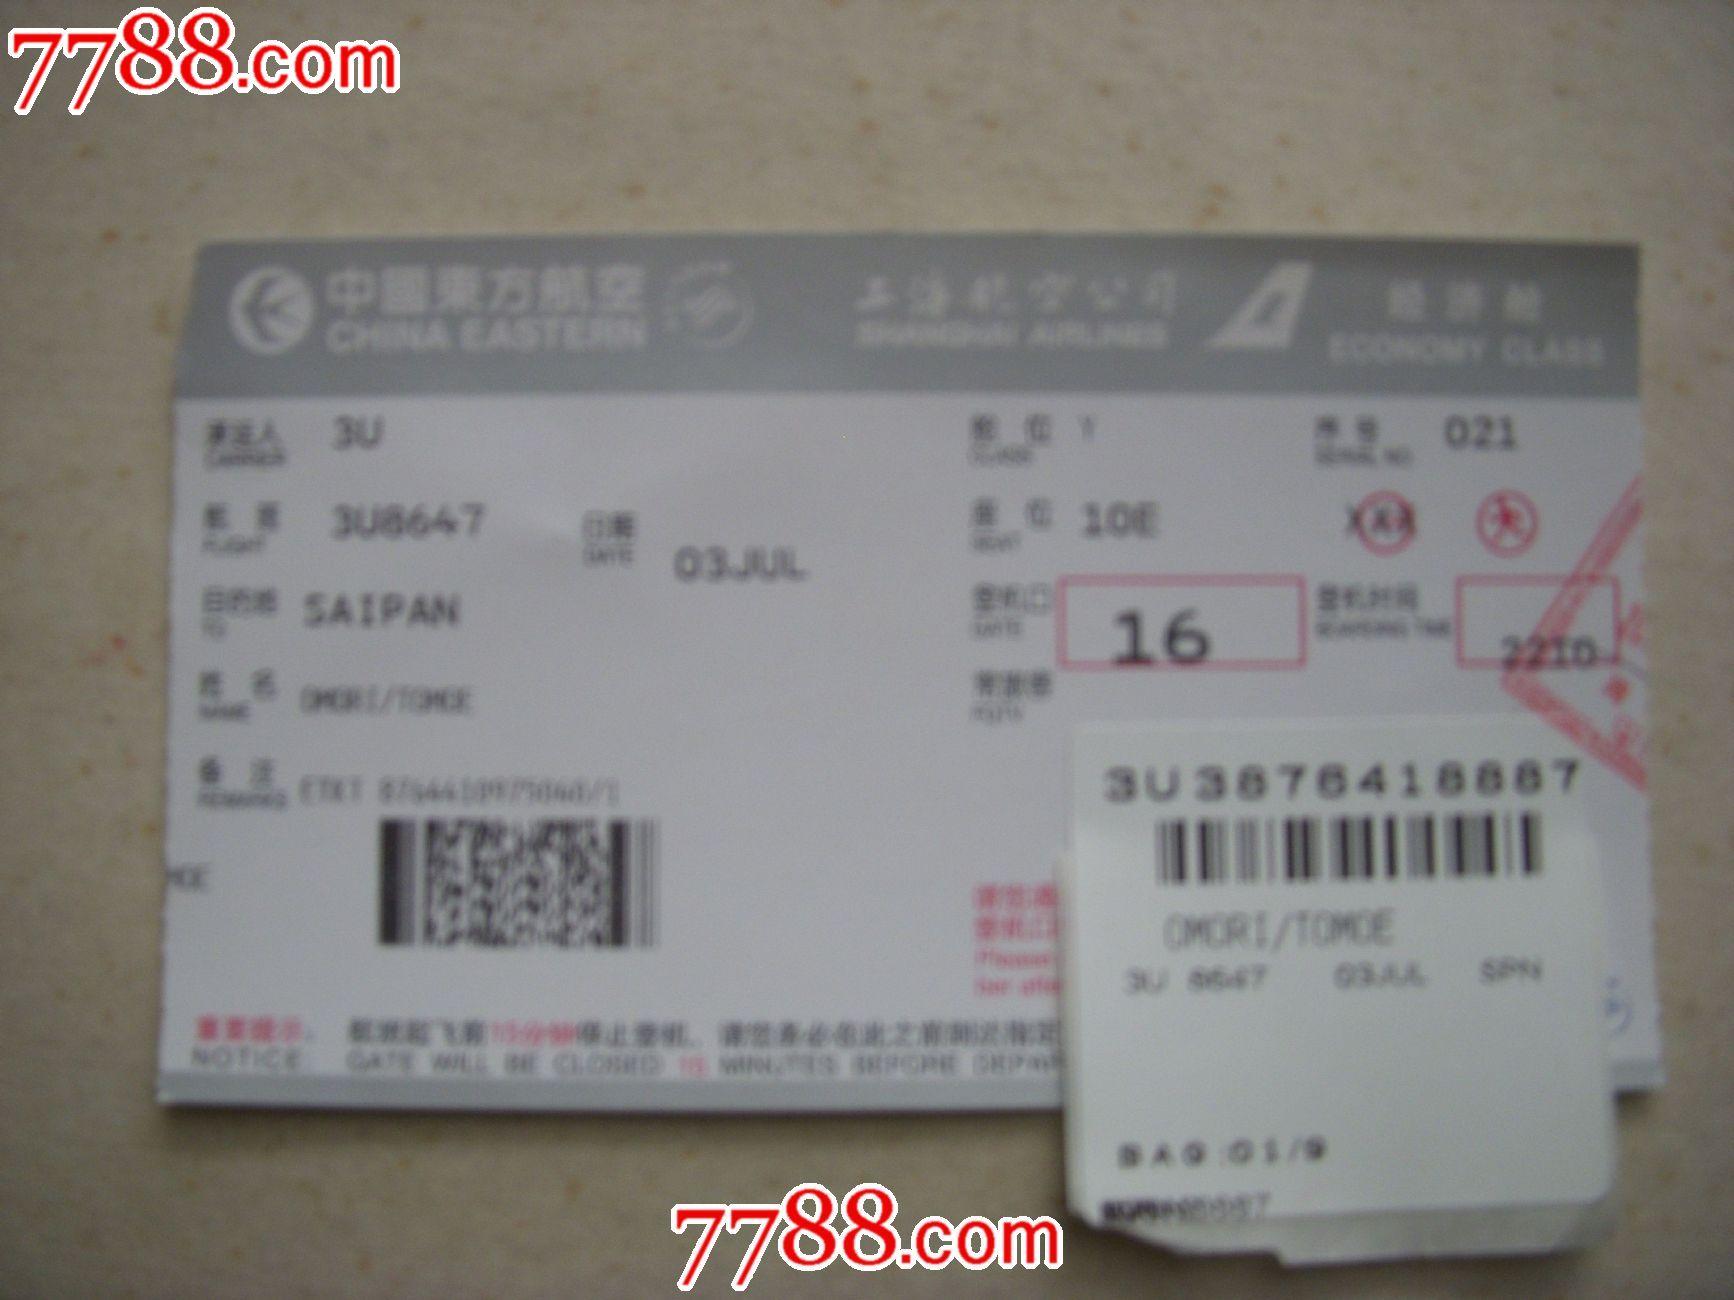 东方航空登机牌-价格:5元-se20156707-飞机/航空票